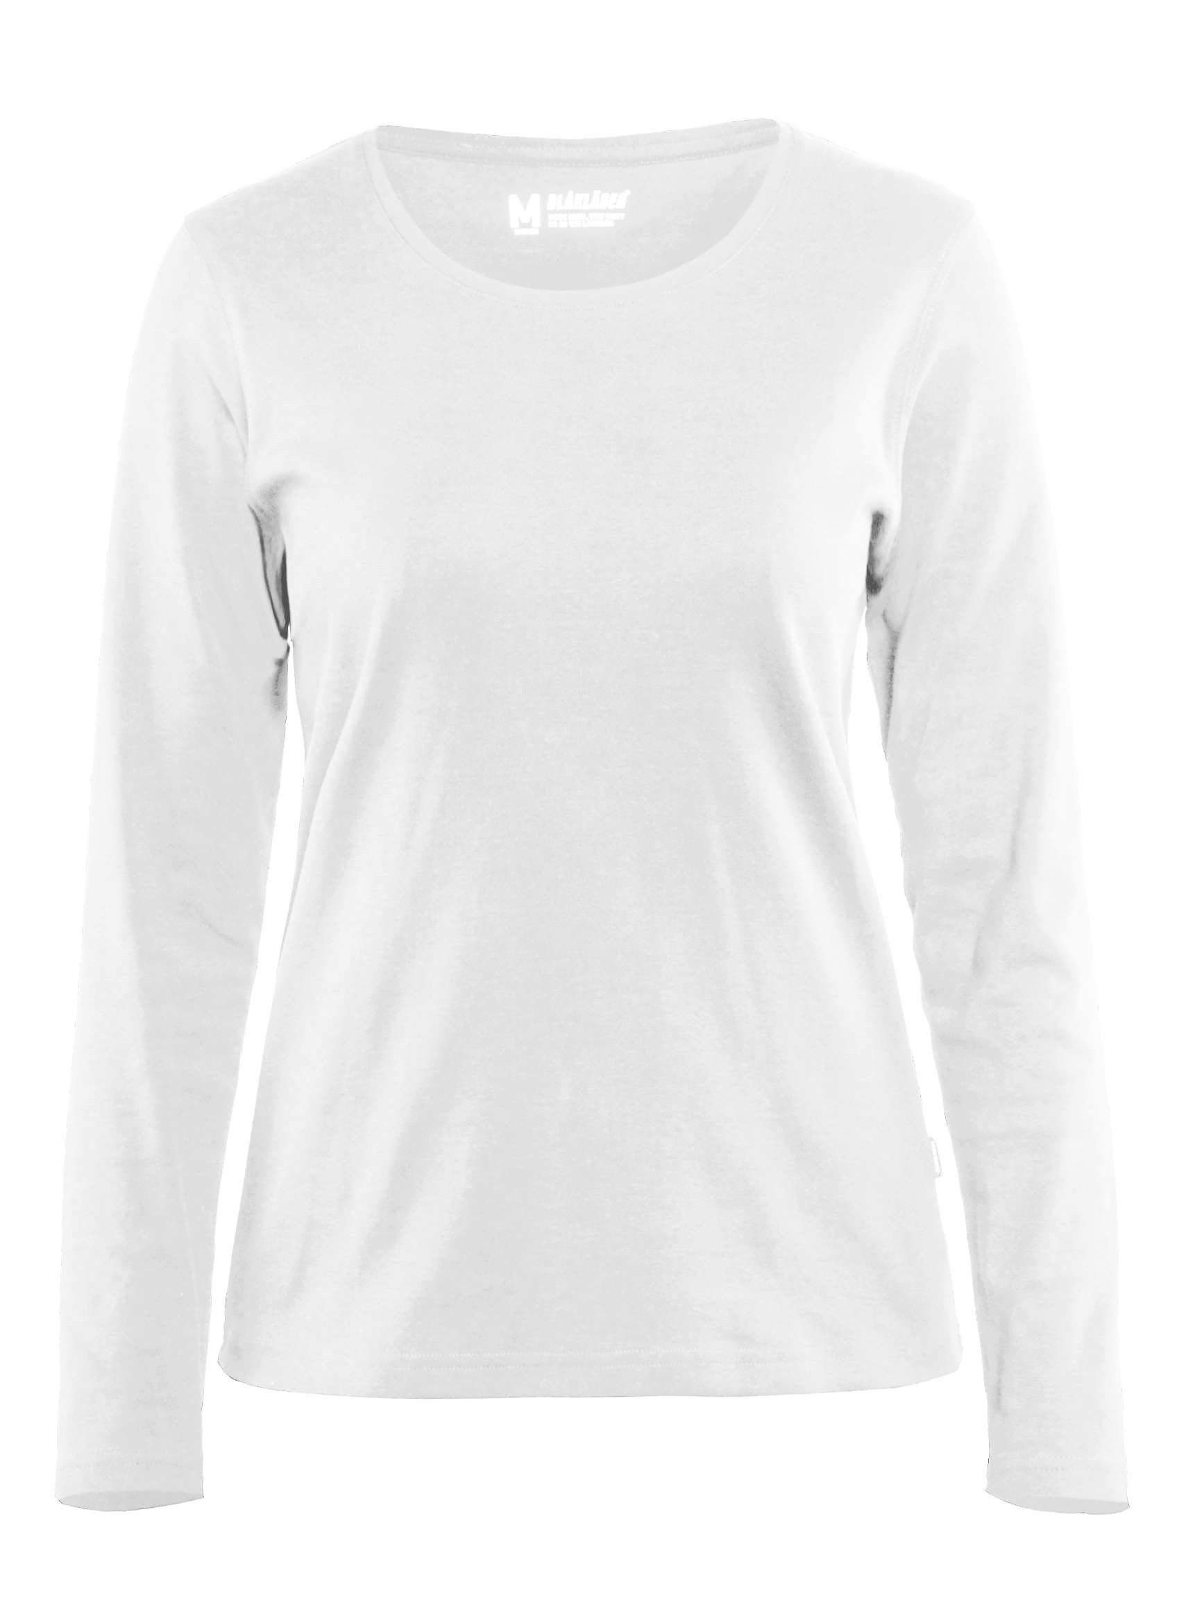 Blaklader Dames T-shirts 33011032 wit(1000)